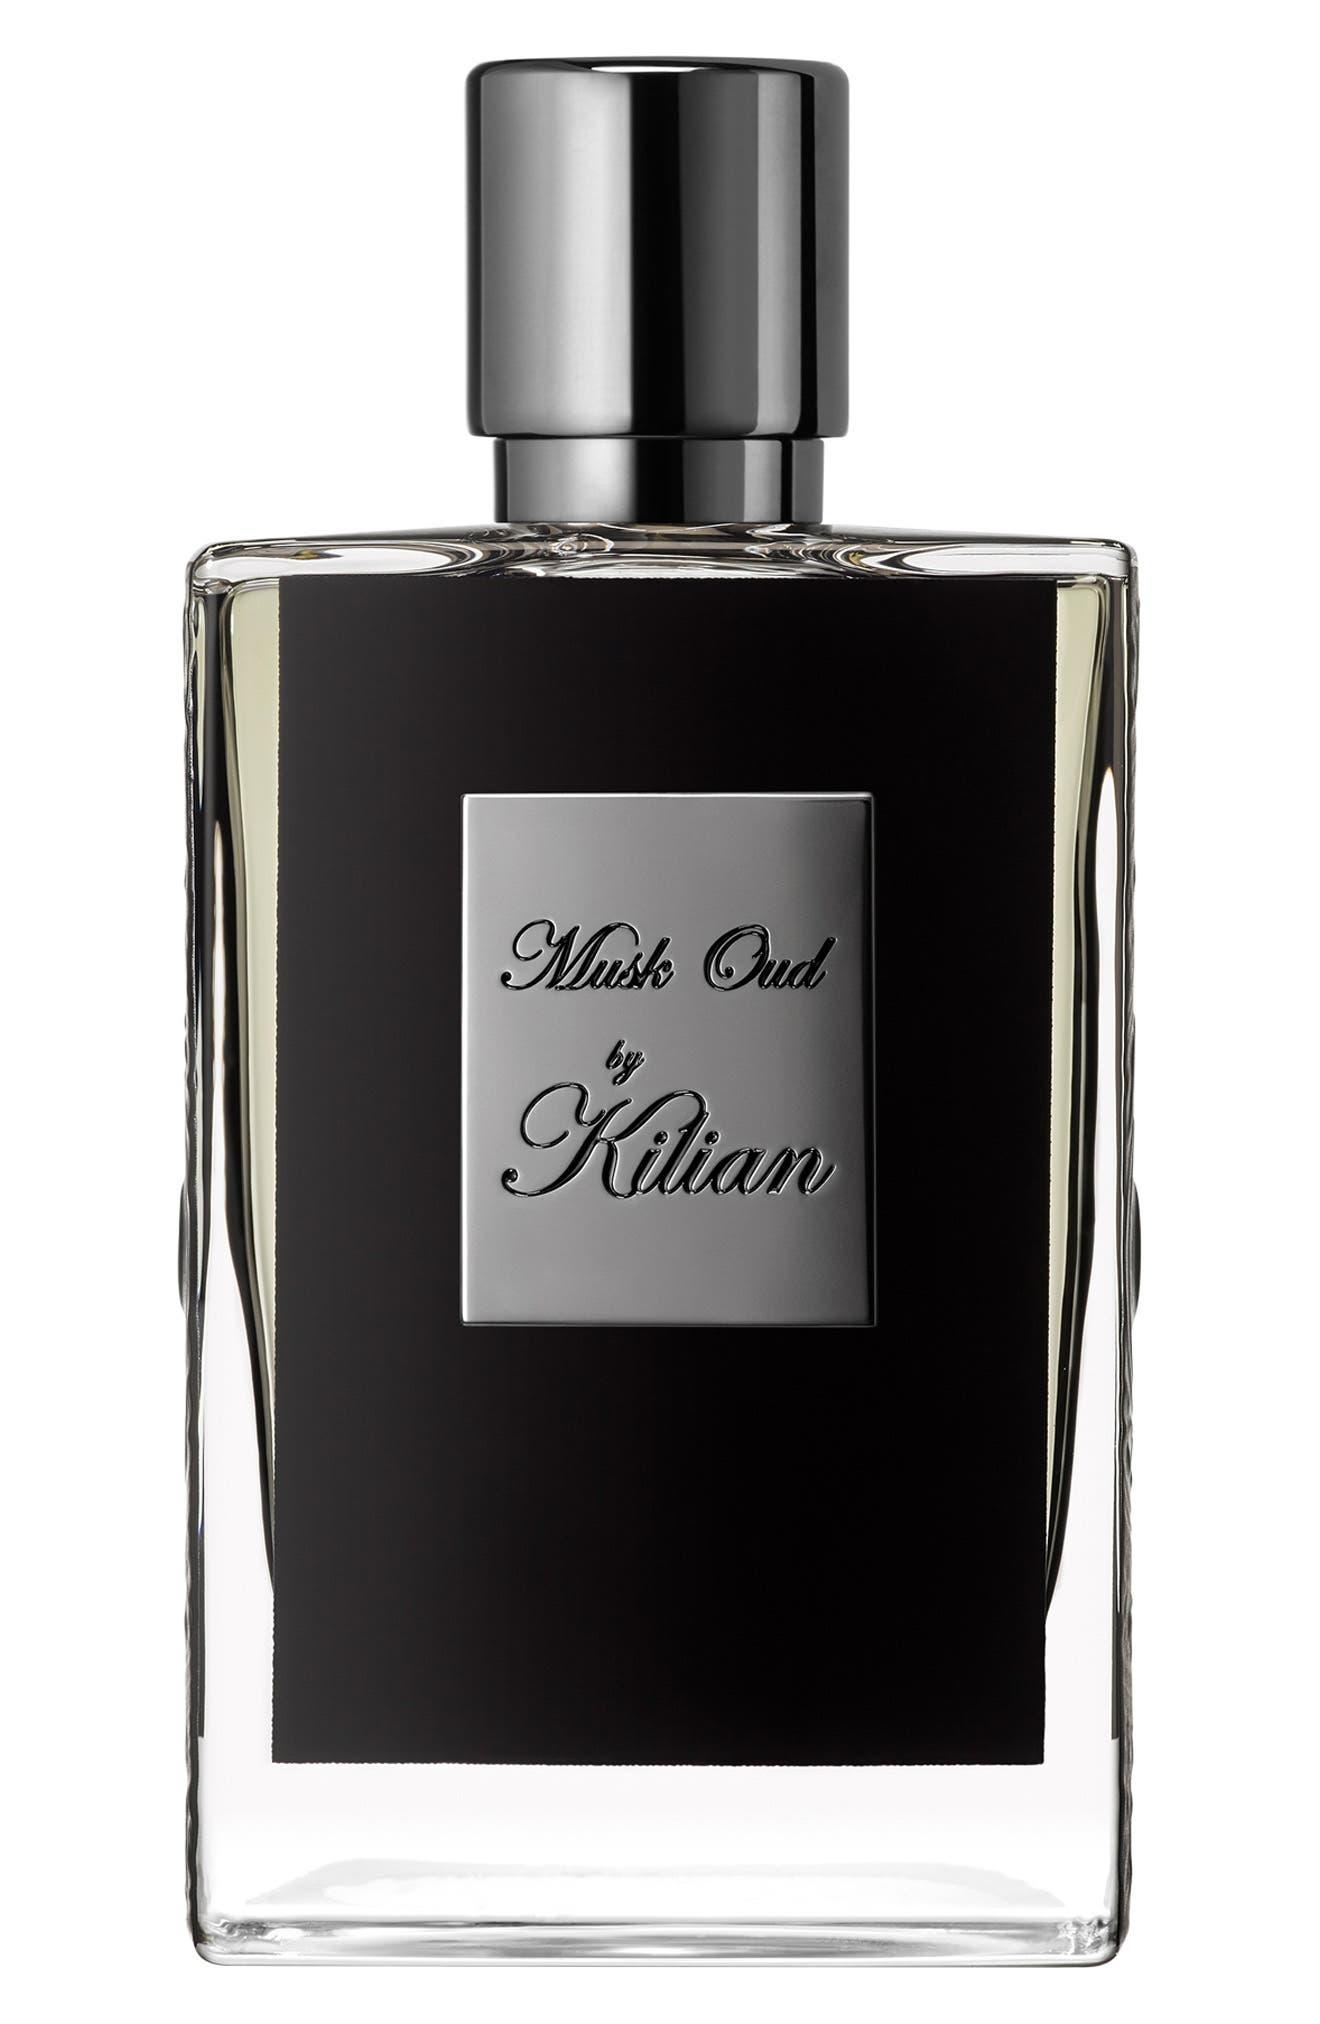 Smokes Musk Oud Refillable Perfume